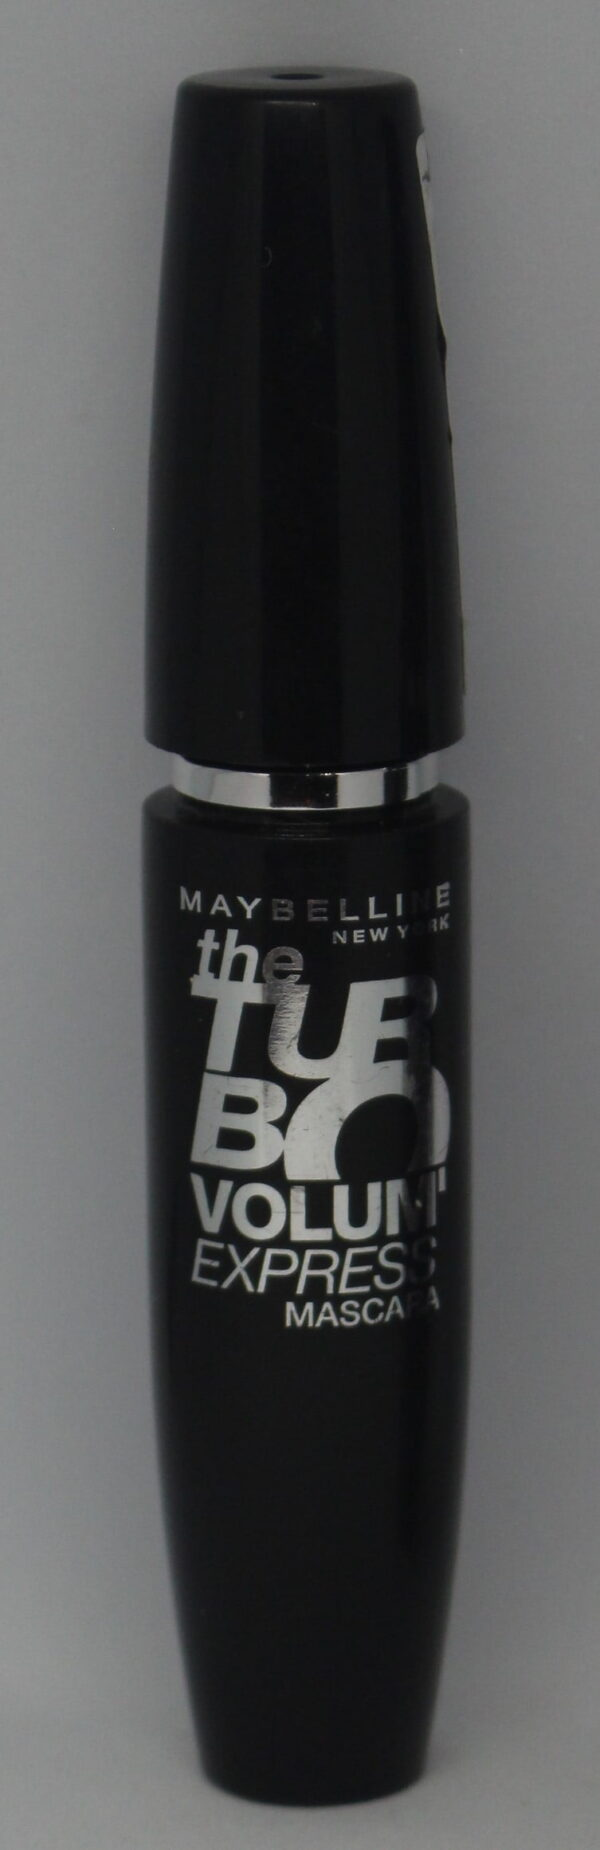 Maybelline The Turbo Volum' Express Mascara